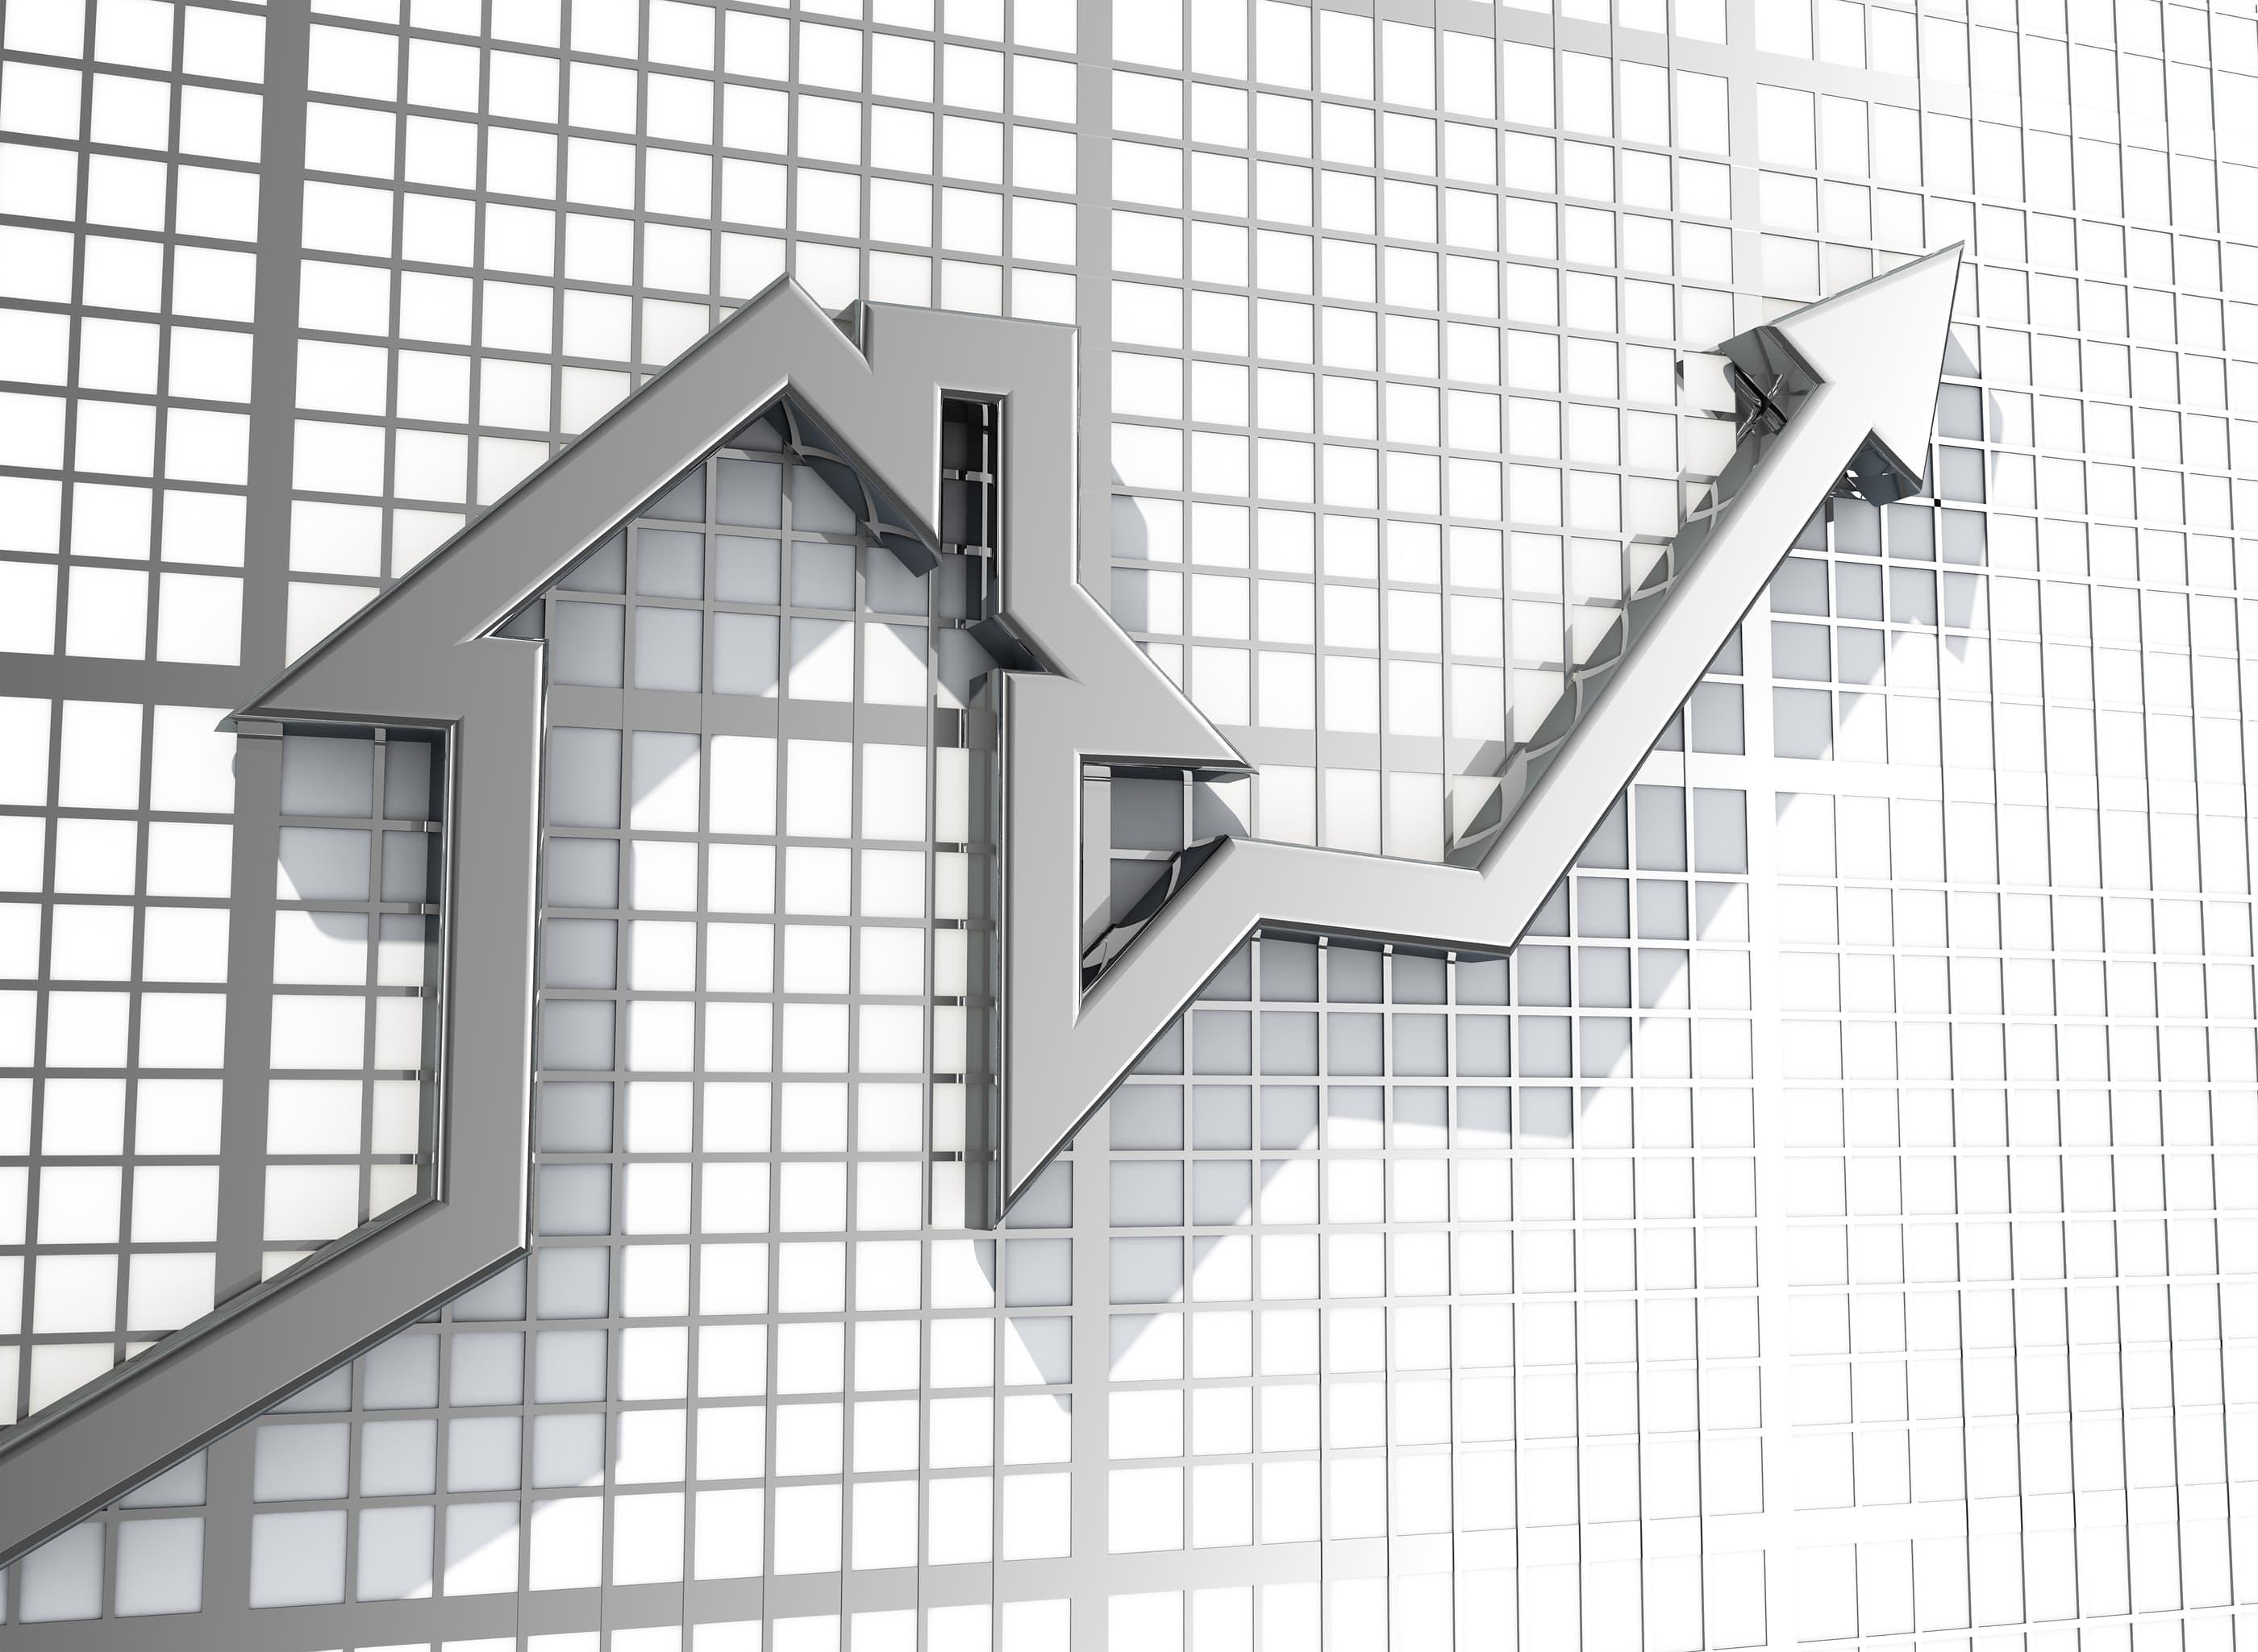 bigstock-Growing-Real-Estate-sales-16975871-min